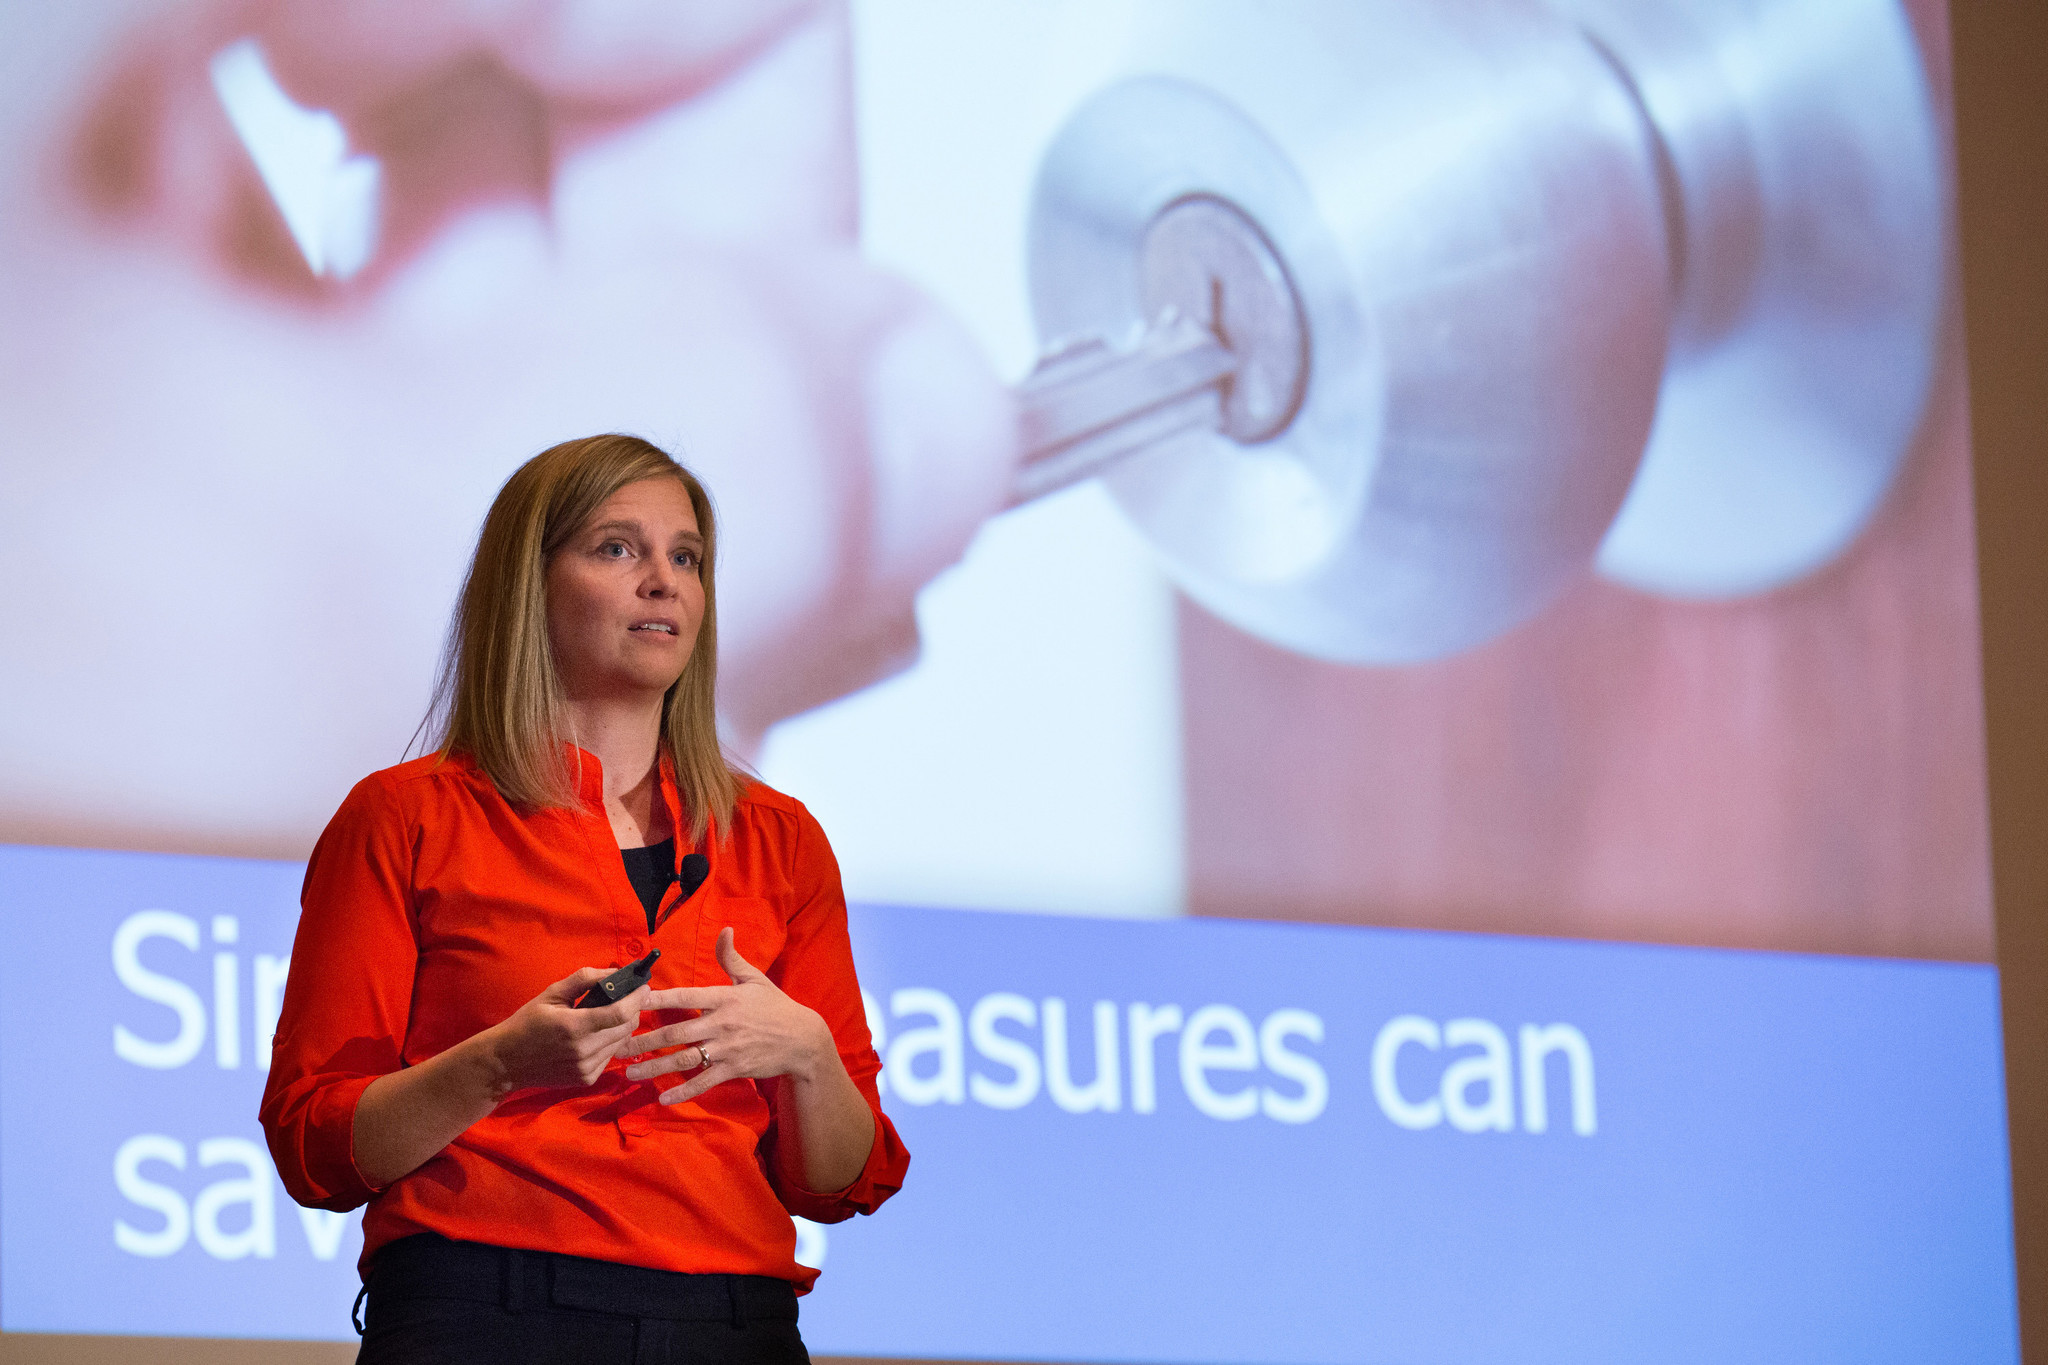 Alissa Parker speaks at the Delaware County DA